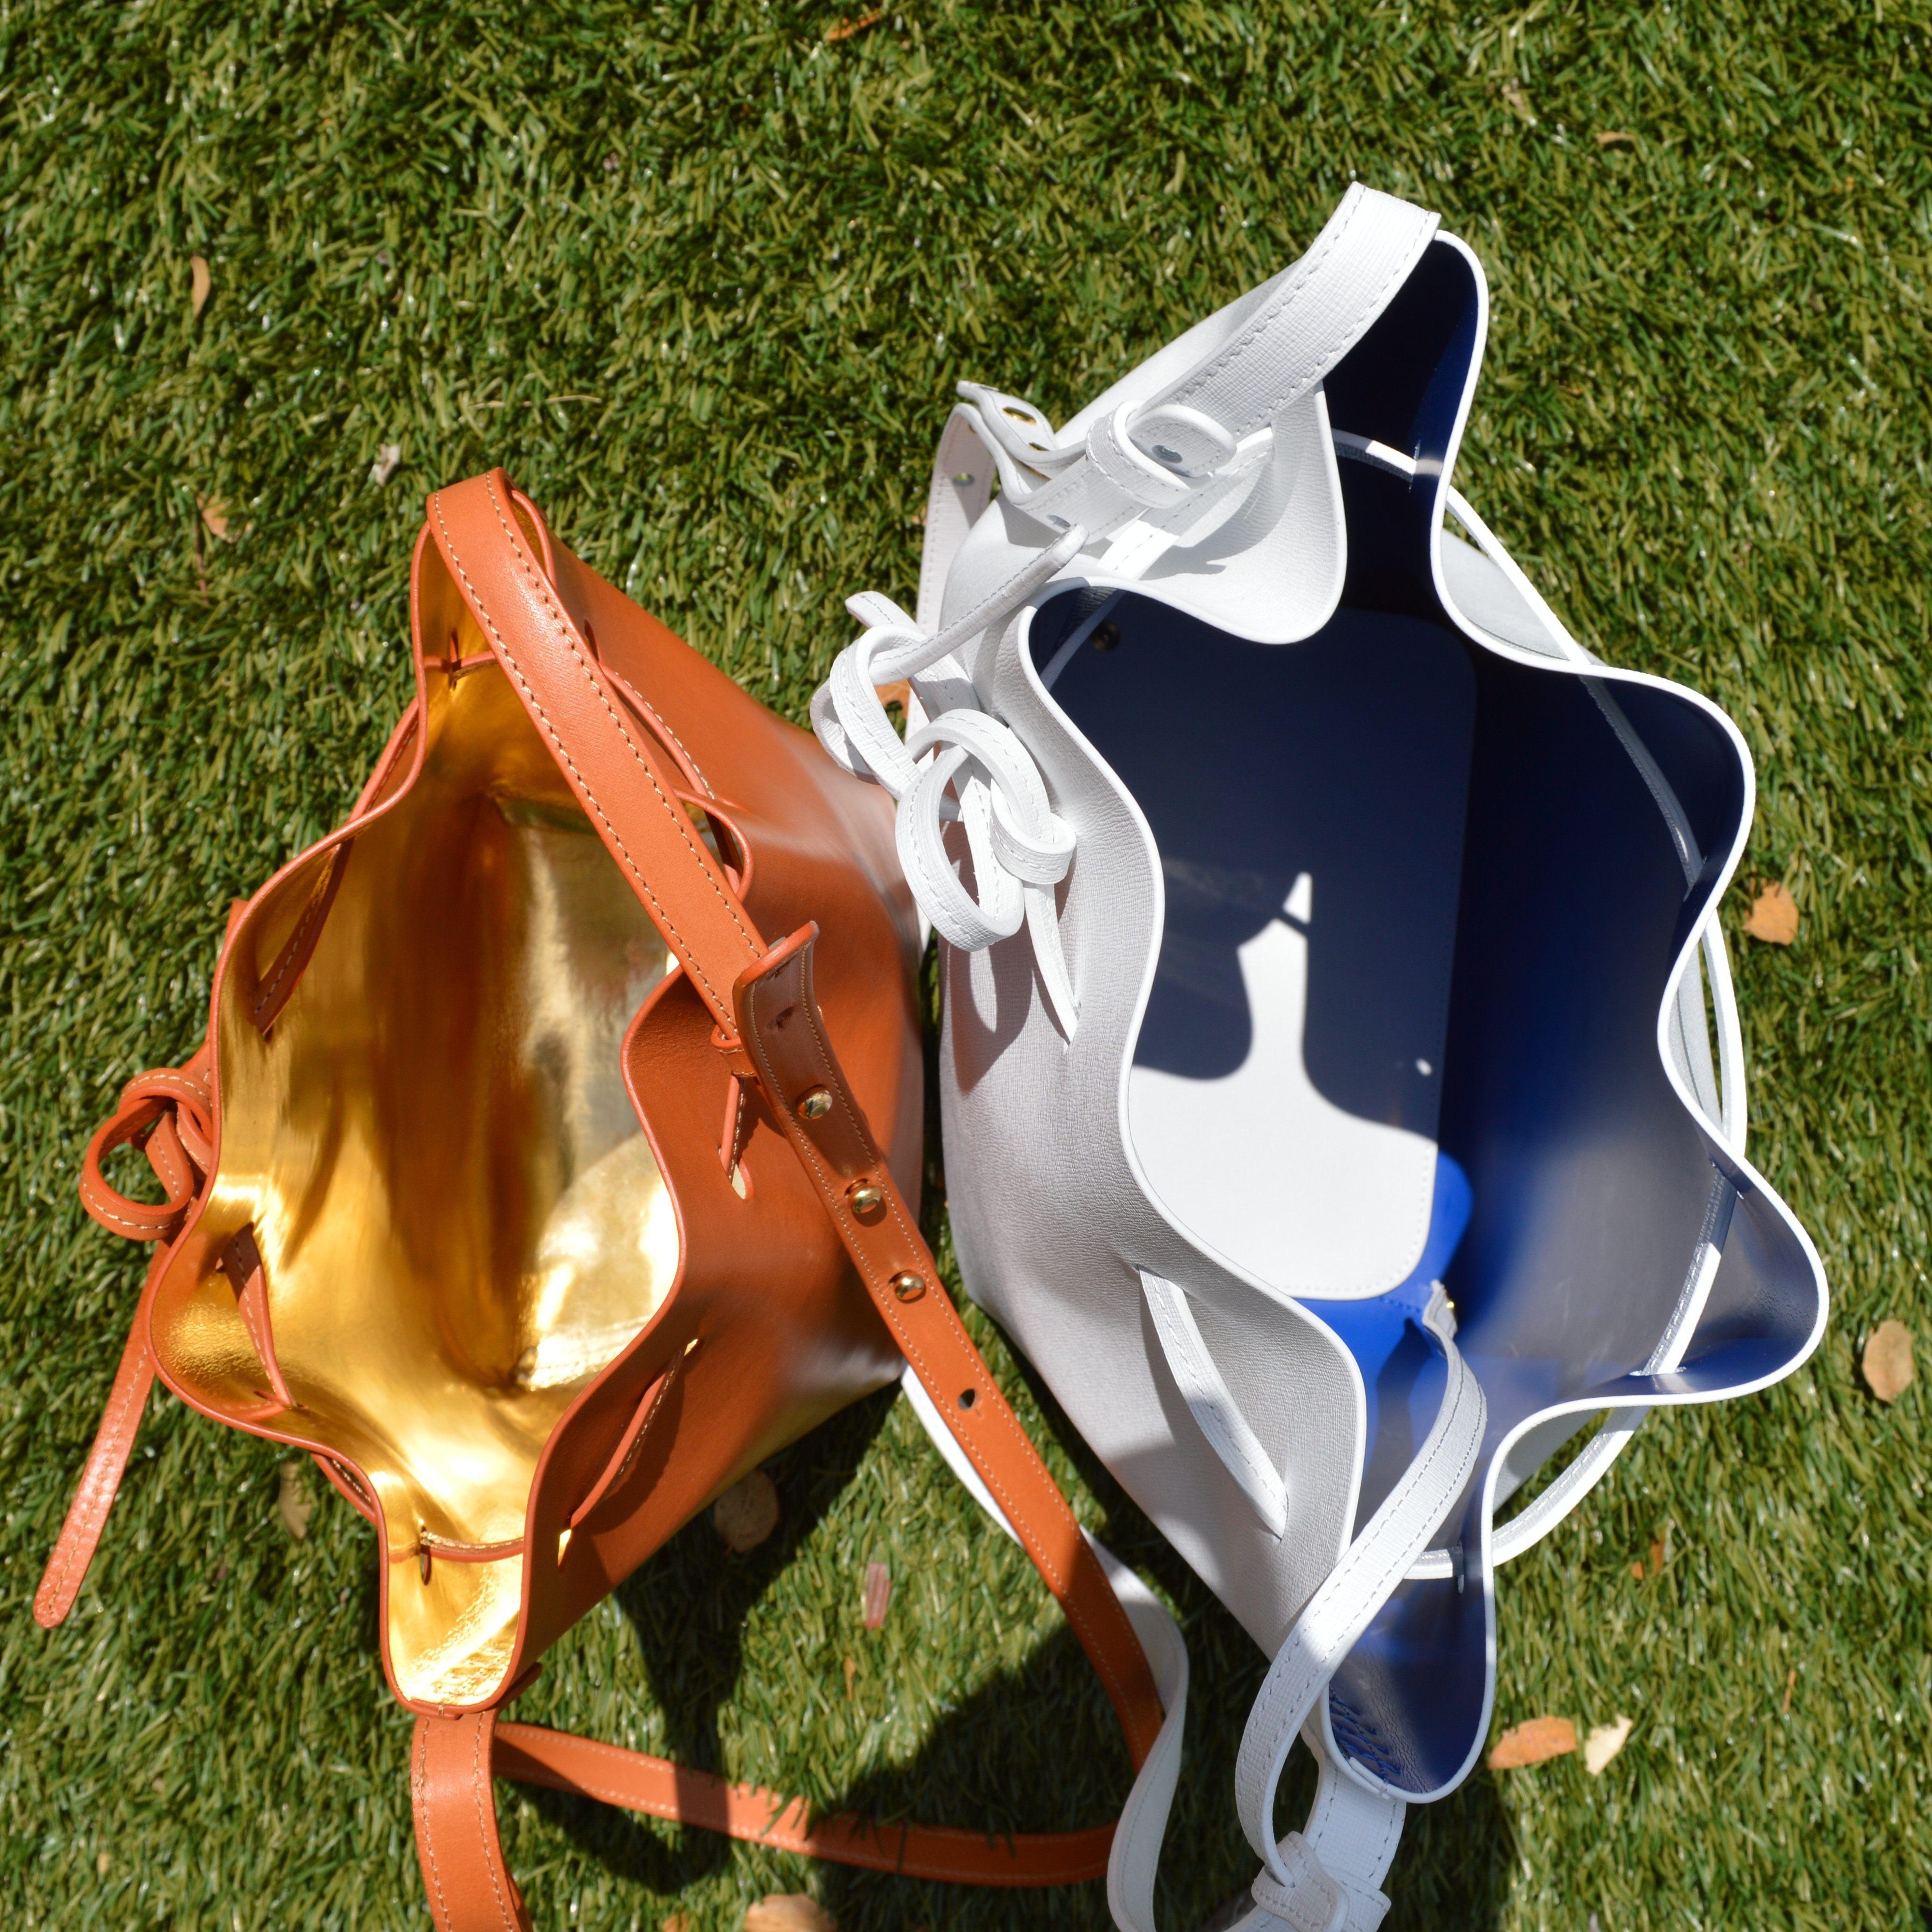 Mansur Gavriel drawstring bucket bag review